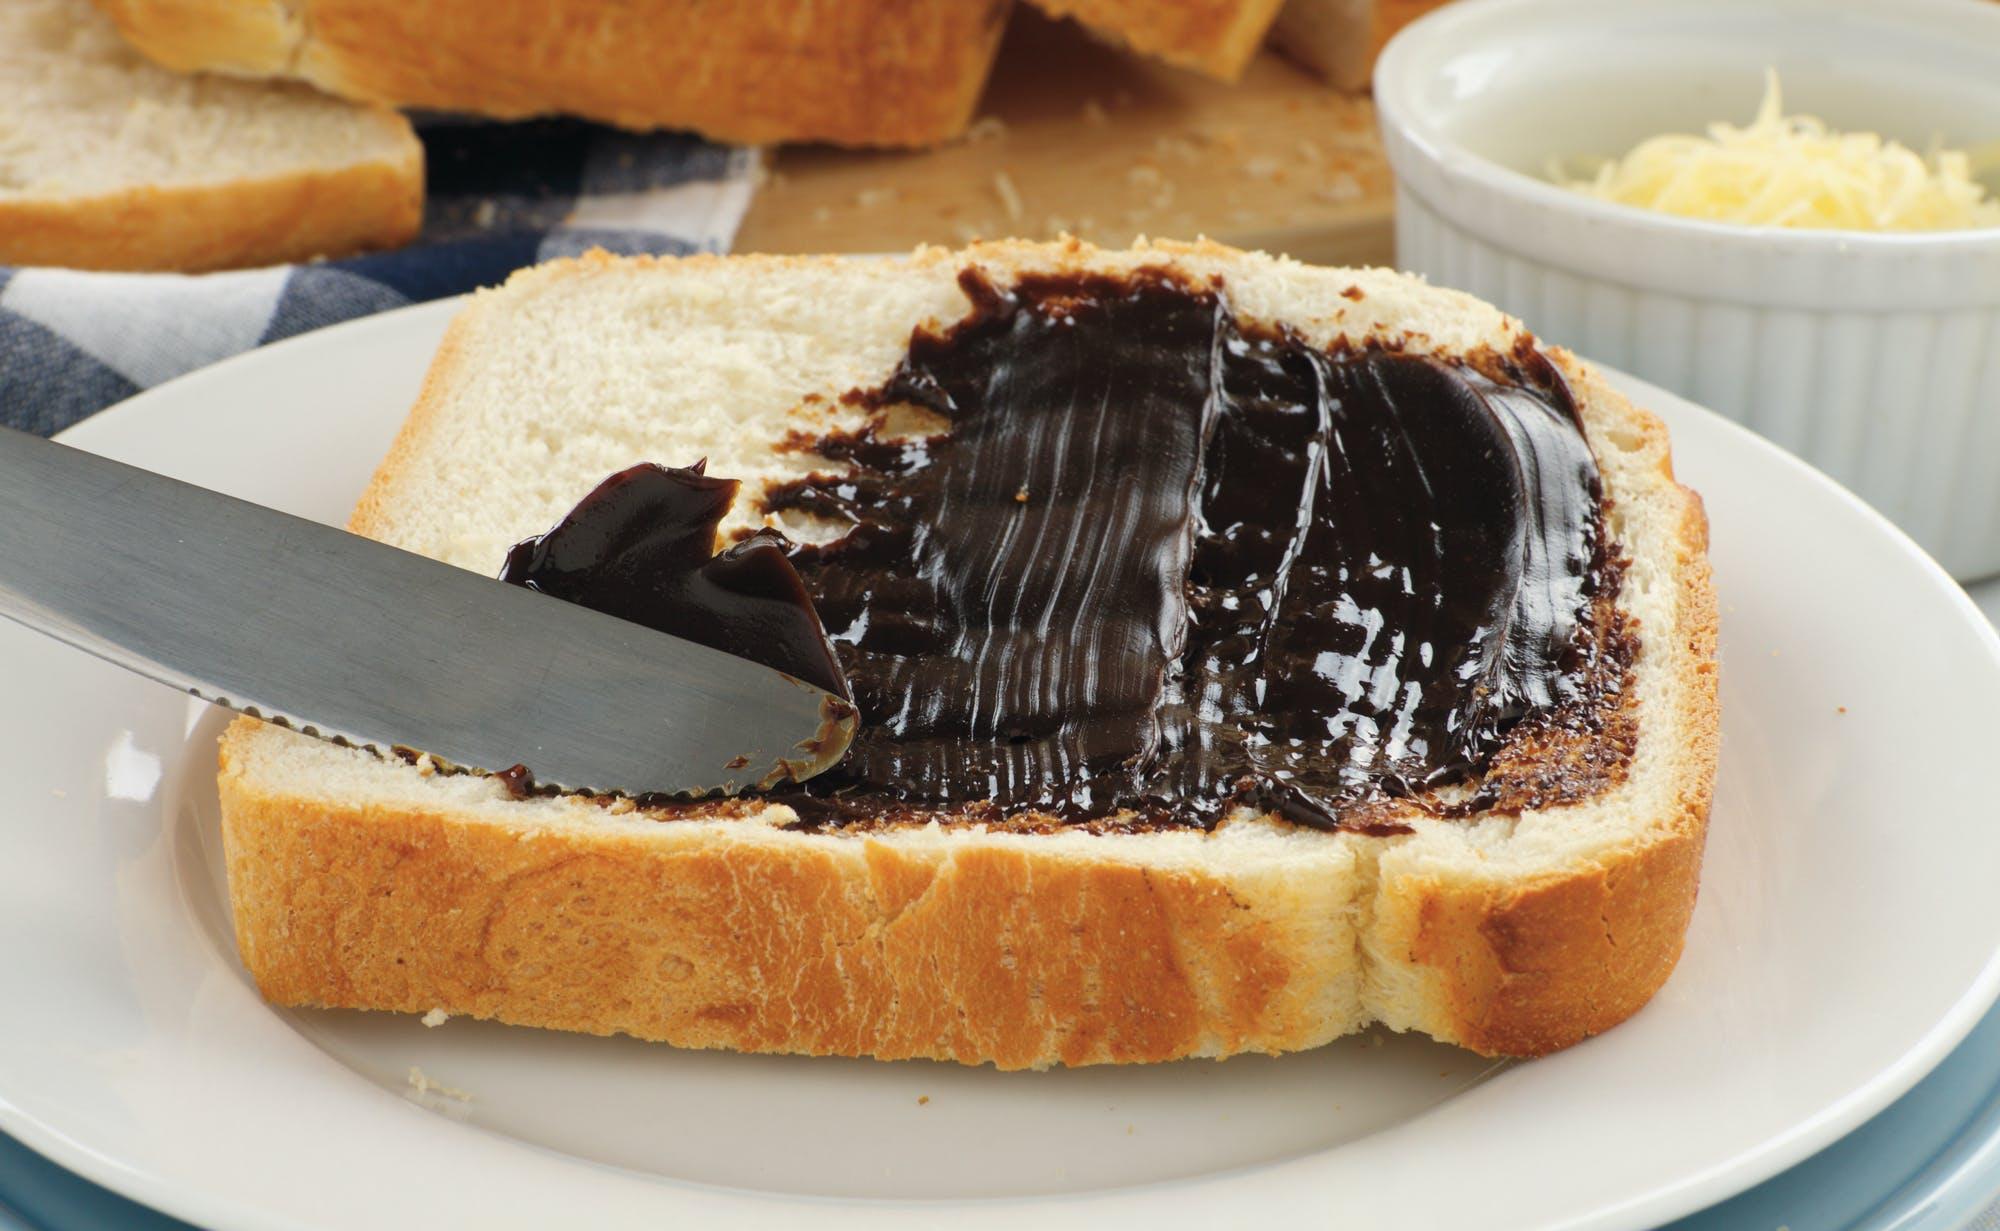 marmite-toast-2013-fullwidth